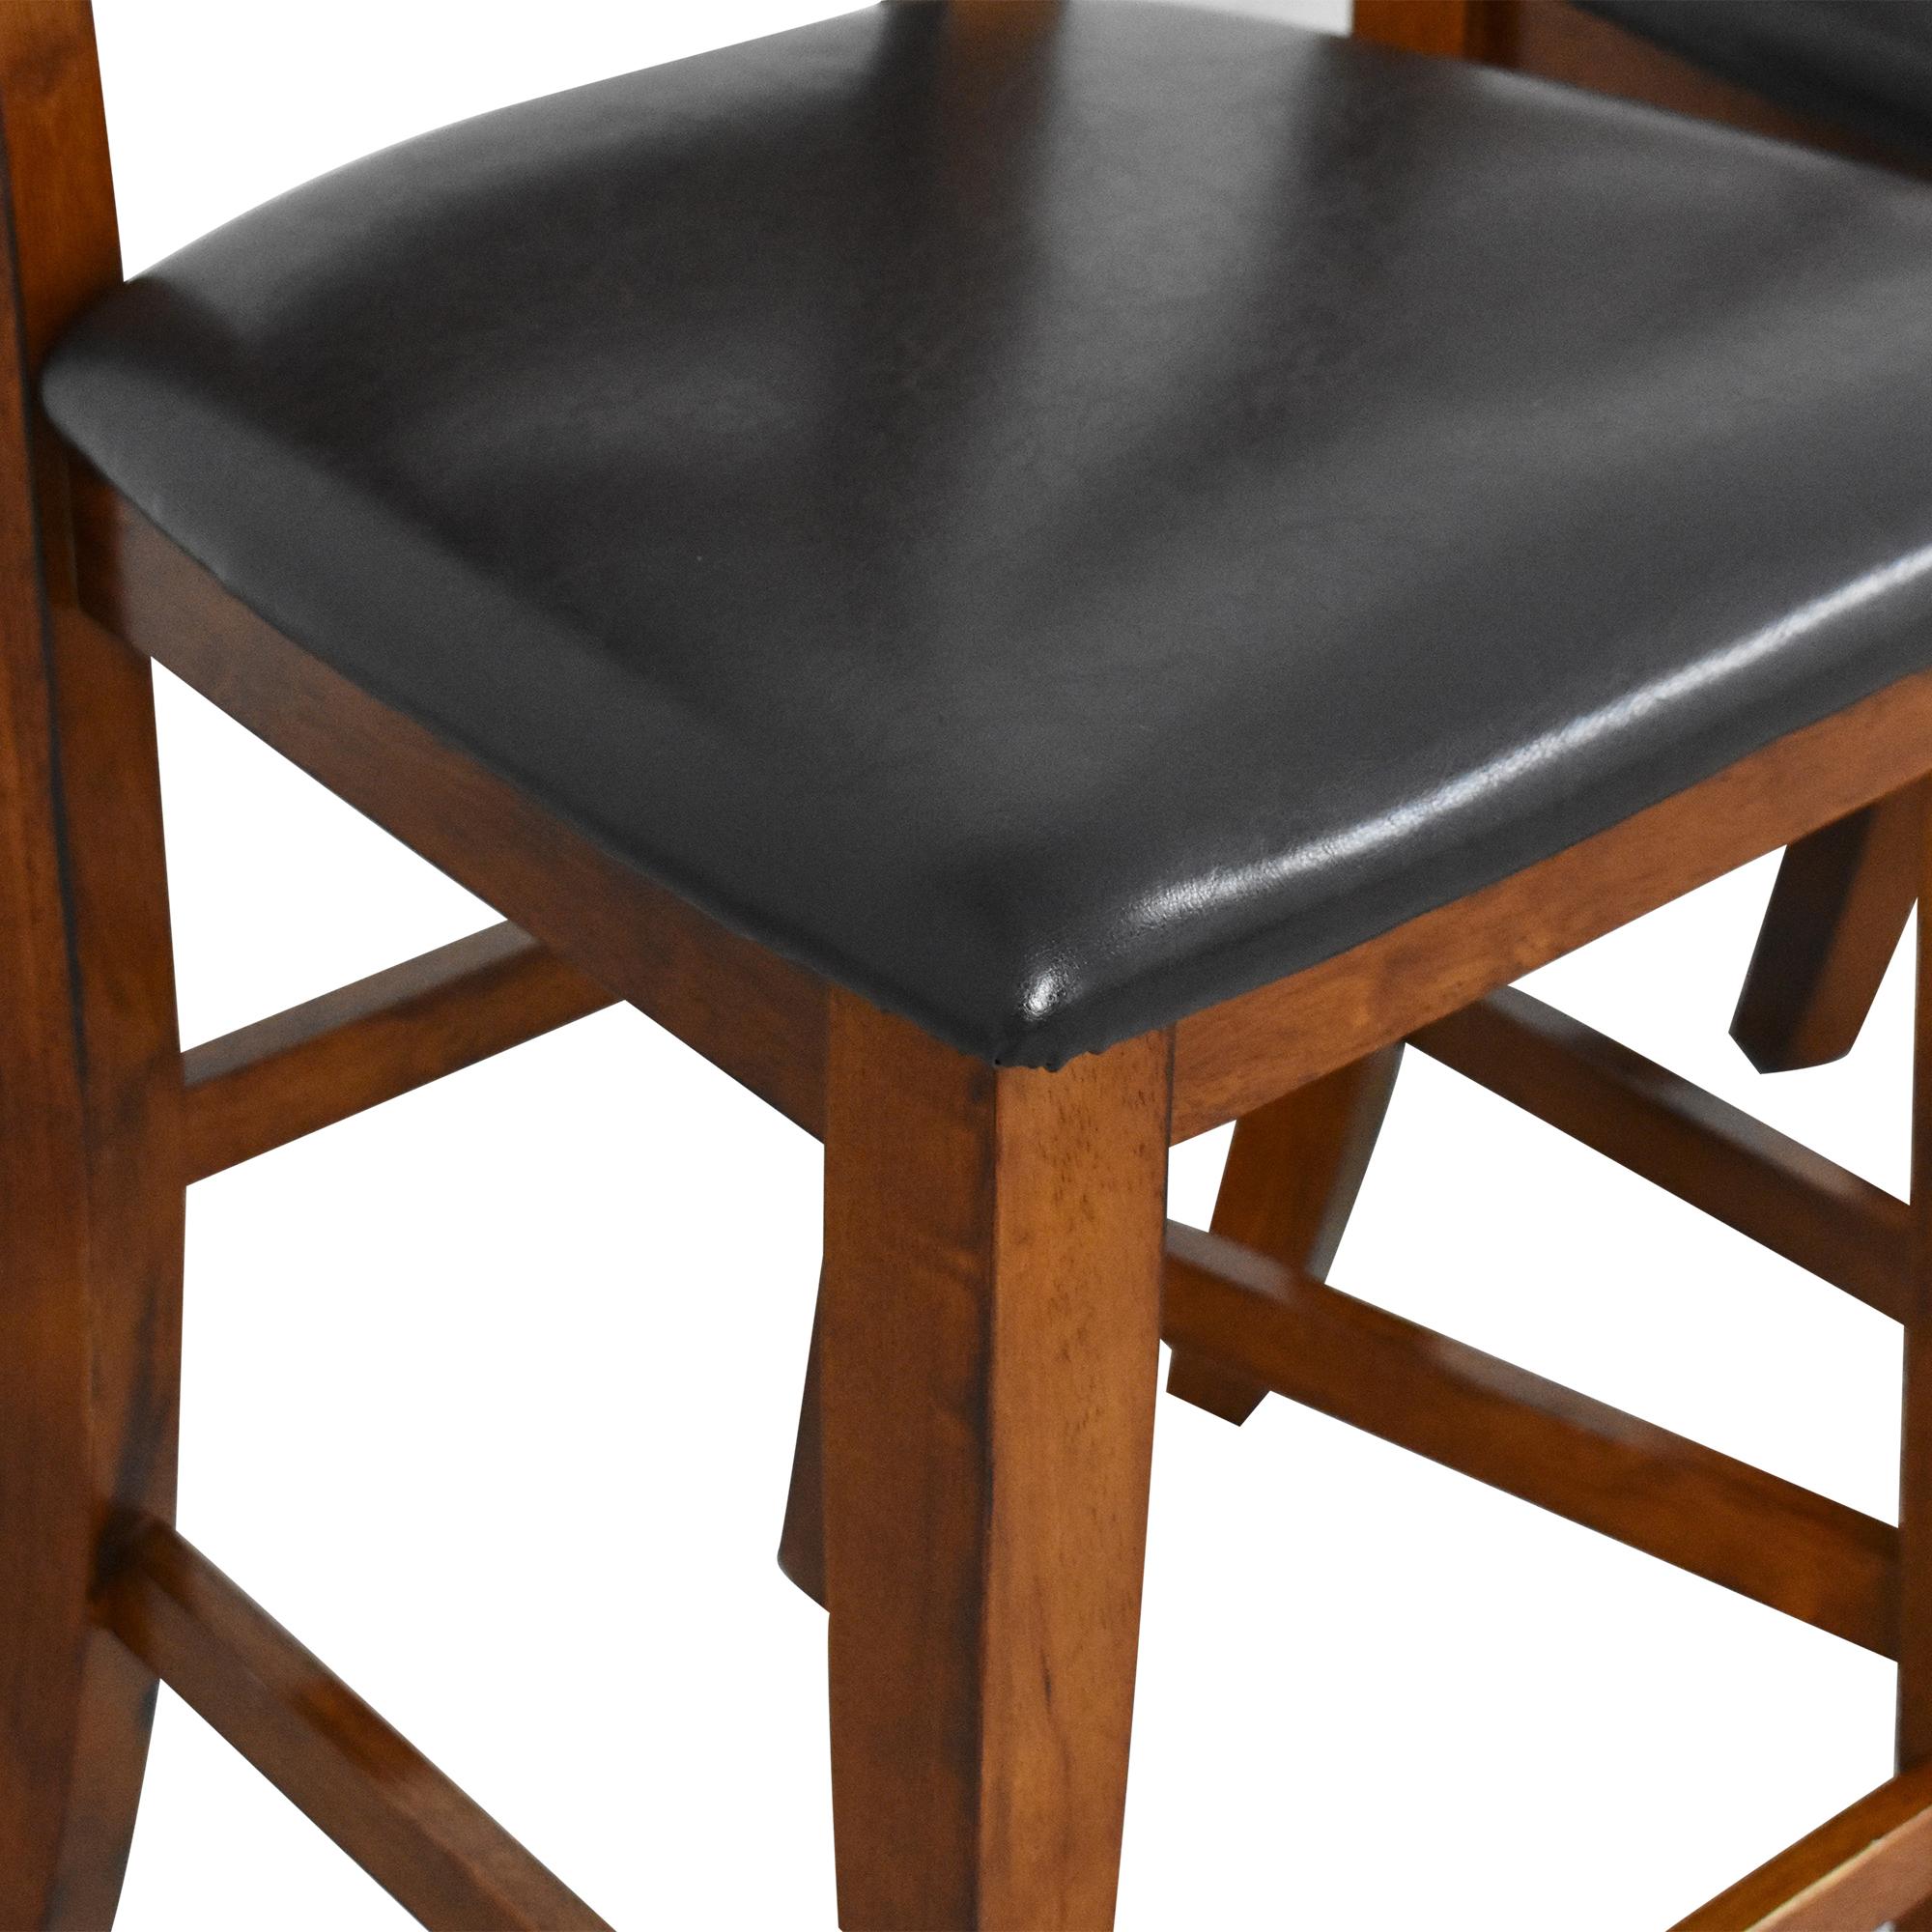 Lenox Lenox Upholstered Counter Stools price